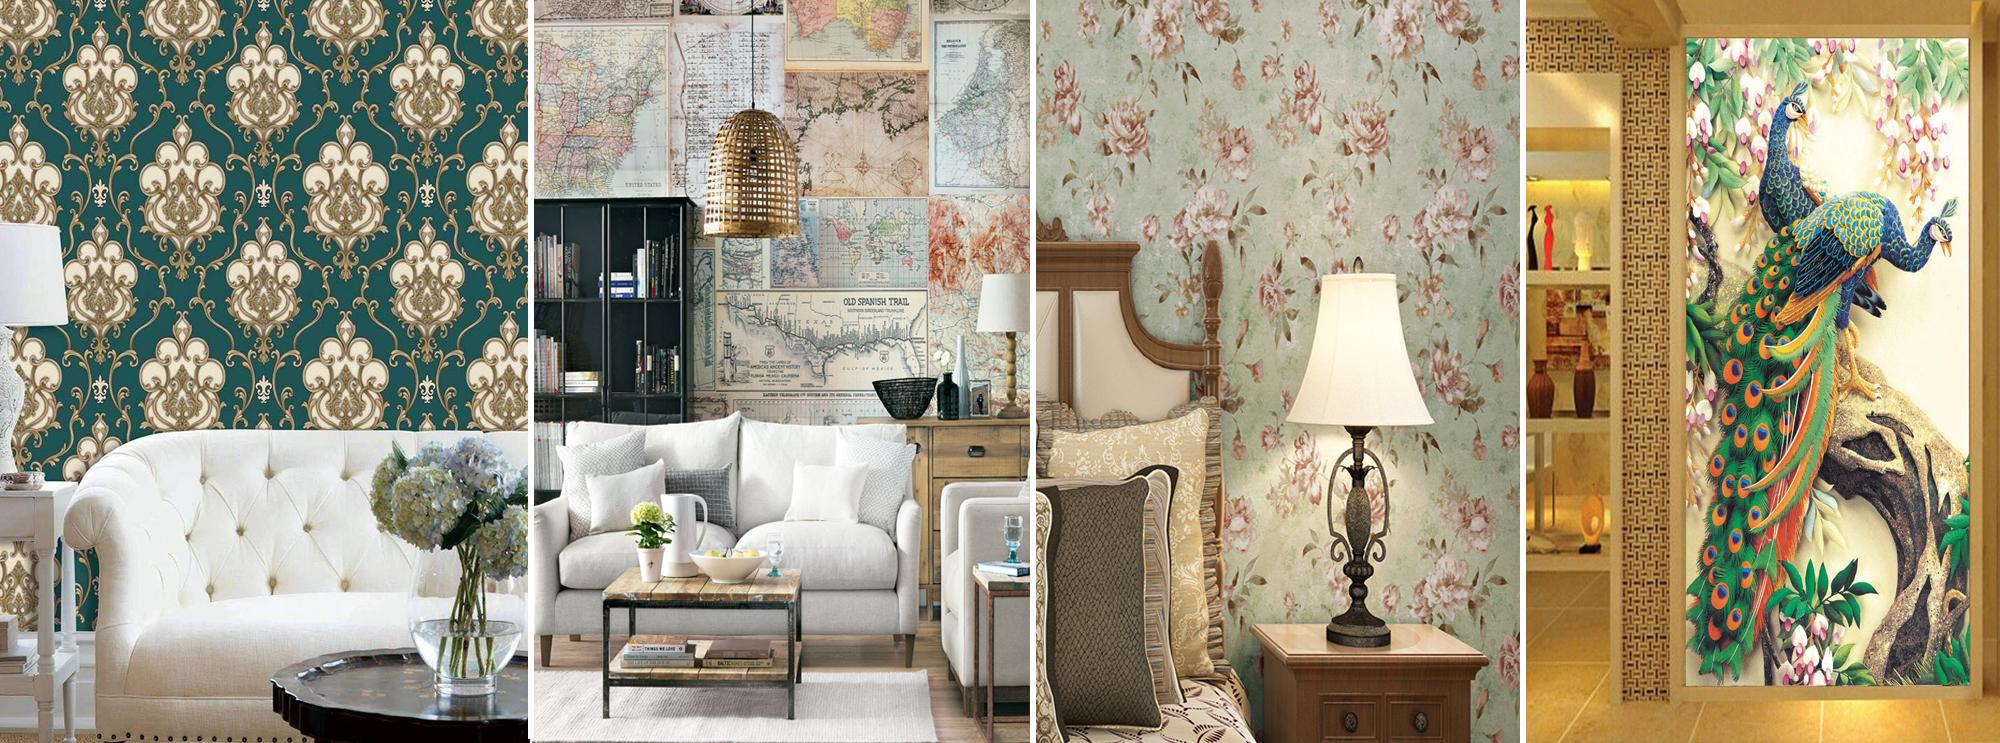 Wallpapers For Wall 3d Wallpaper For Bedroom Walls - Living Room - HD Wallpaper